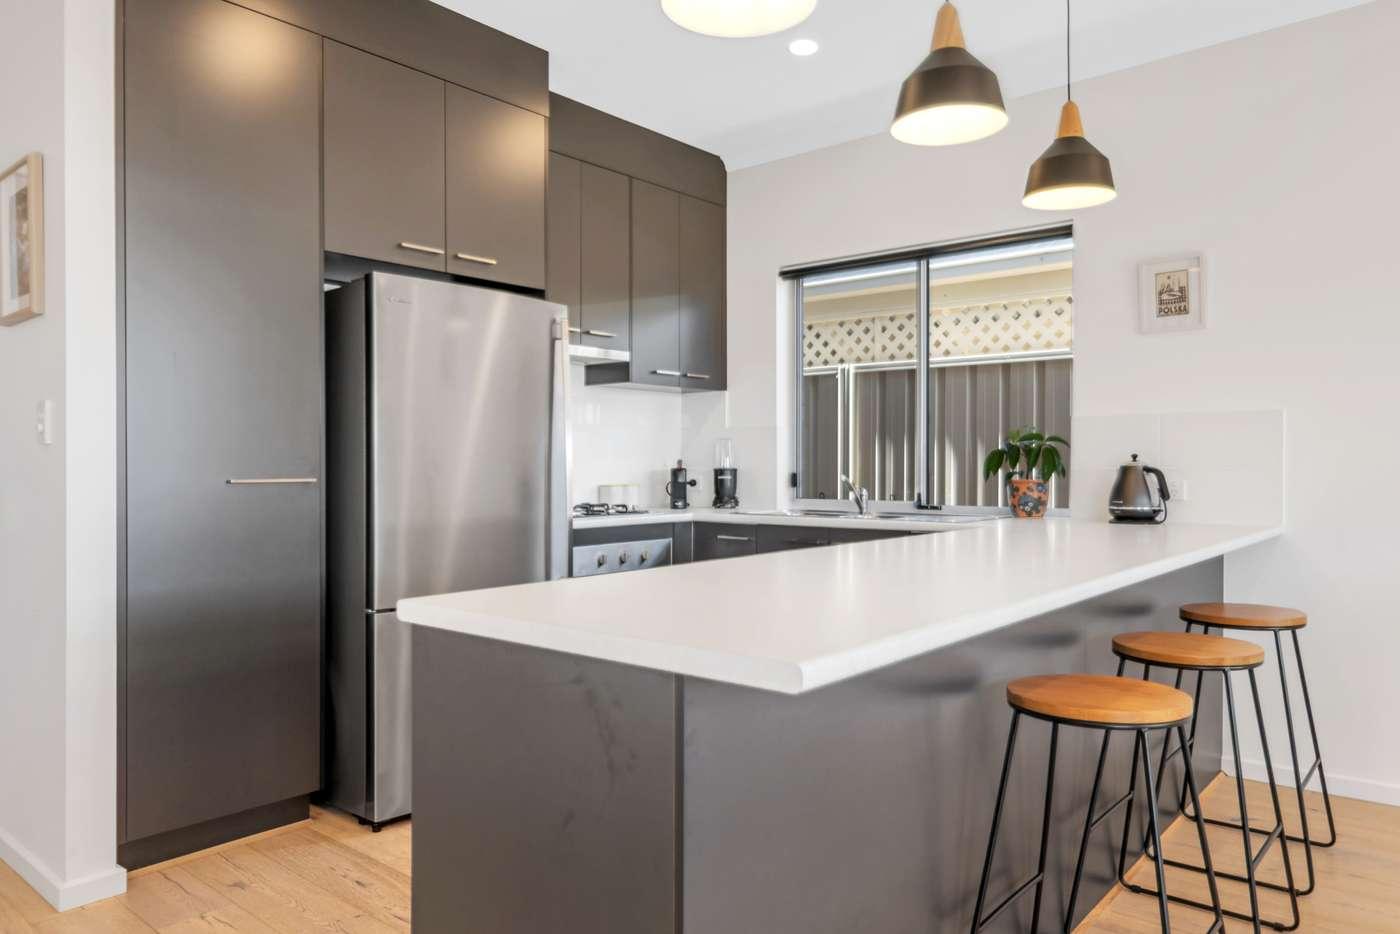 Sixth view of Homely house listing, 84 Marston Drive, Morphett Vale SA 5162